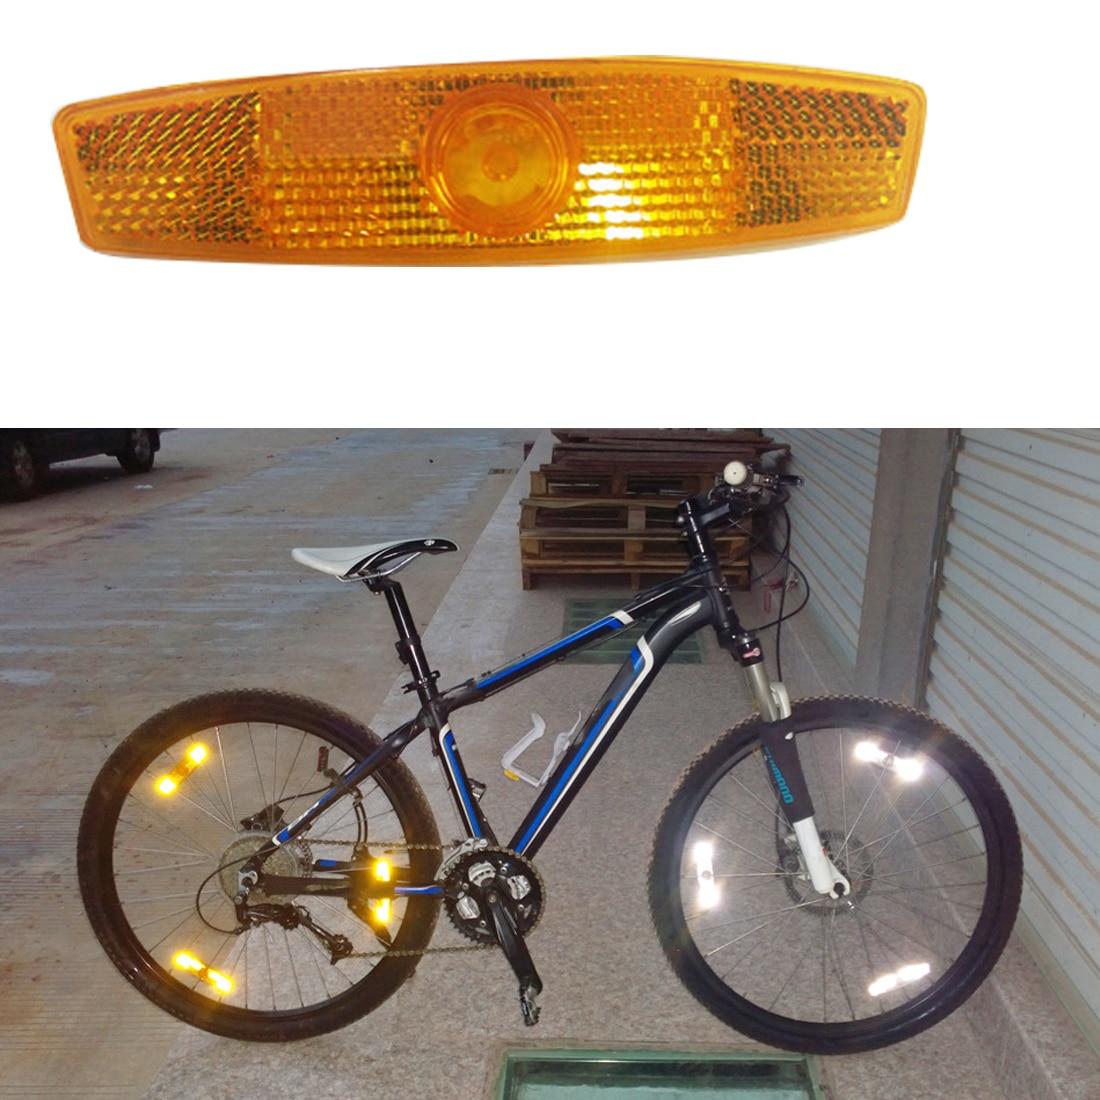 1 Pair Spoke Reflector Warning Lights Wheel Reflective Mountain Bike Bicycle